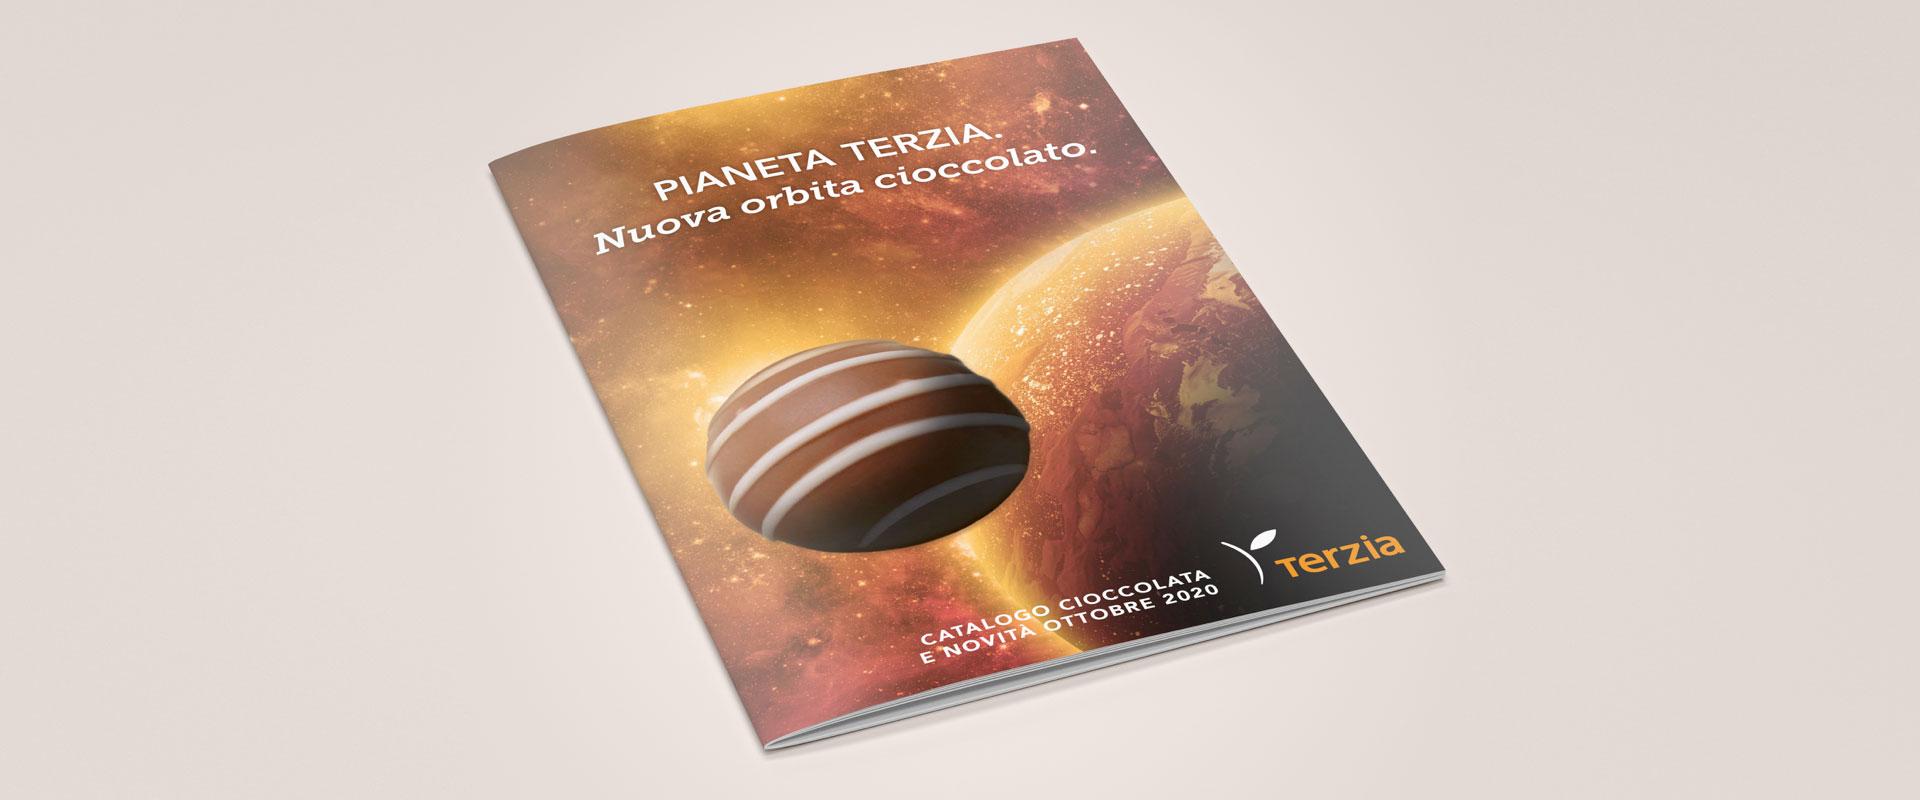 Speciale cioccolato Terzia 2020